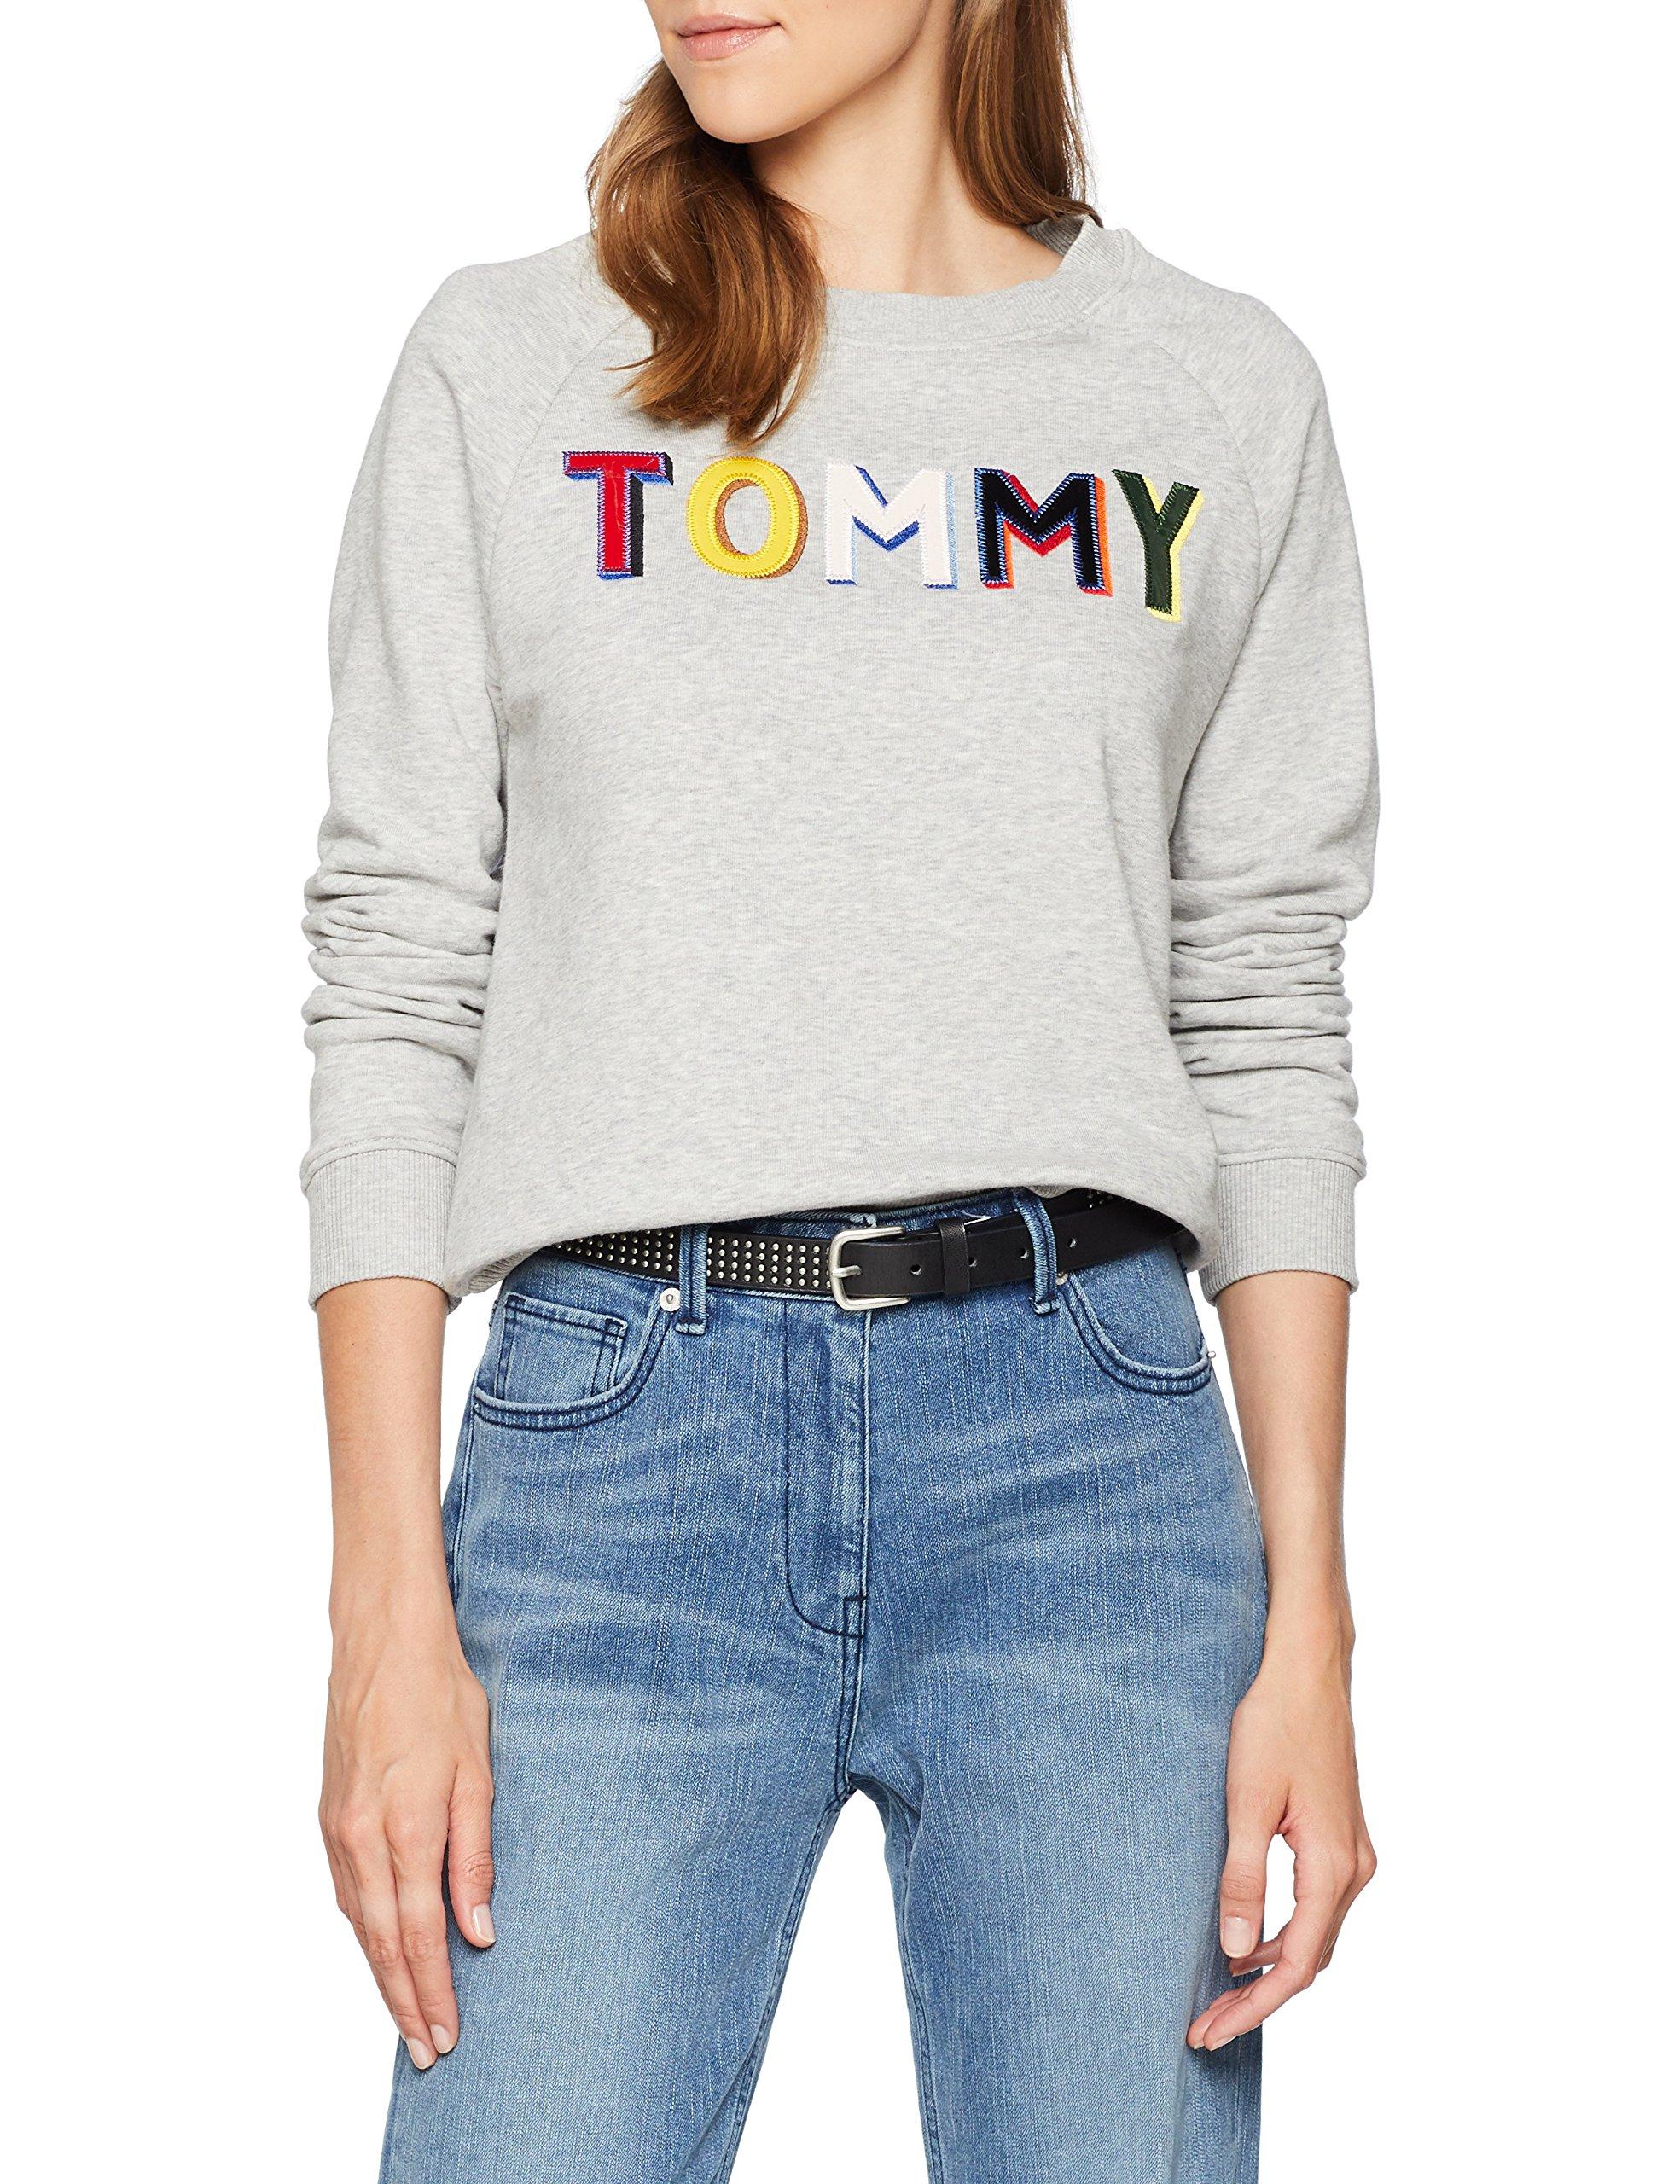 Tommy Hilfiger Francesca C-nk Sweatshirt LS Sudadera para Mujer